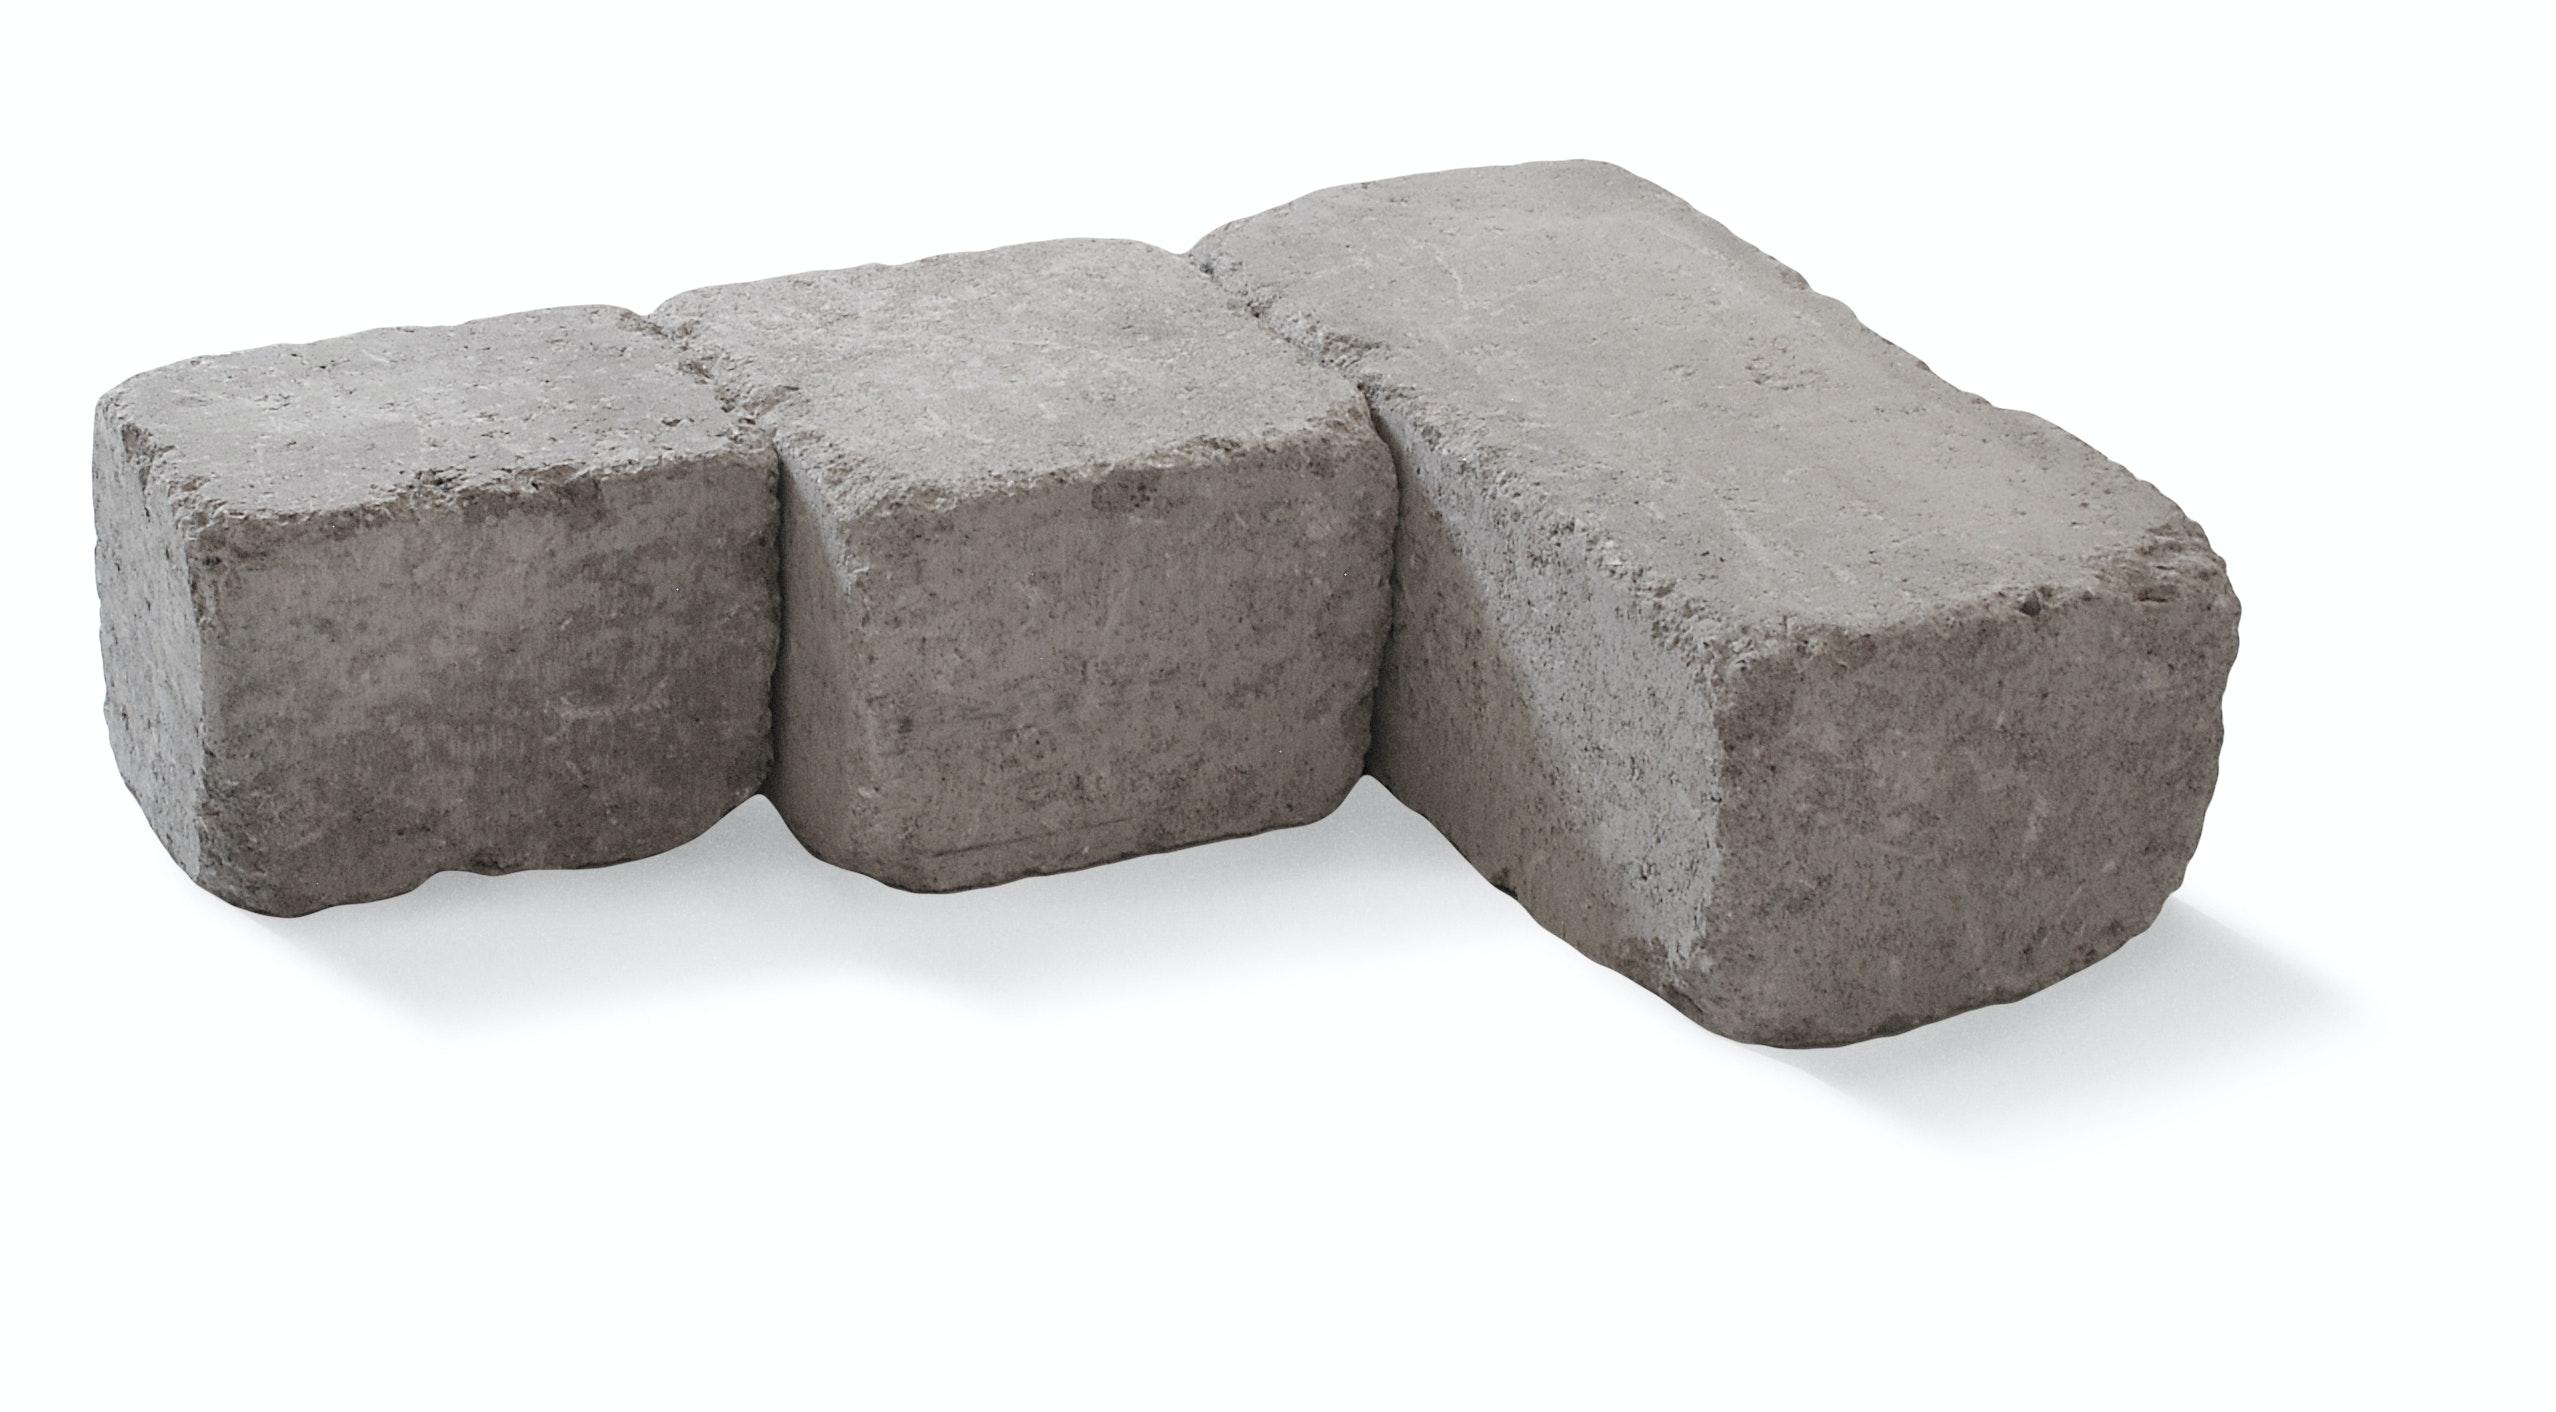 Mursten S:t Eriks Rustik block multi naturgrå 19,0x13,8x13,8cm